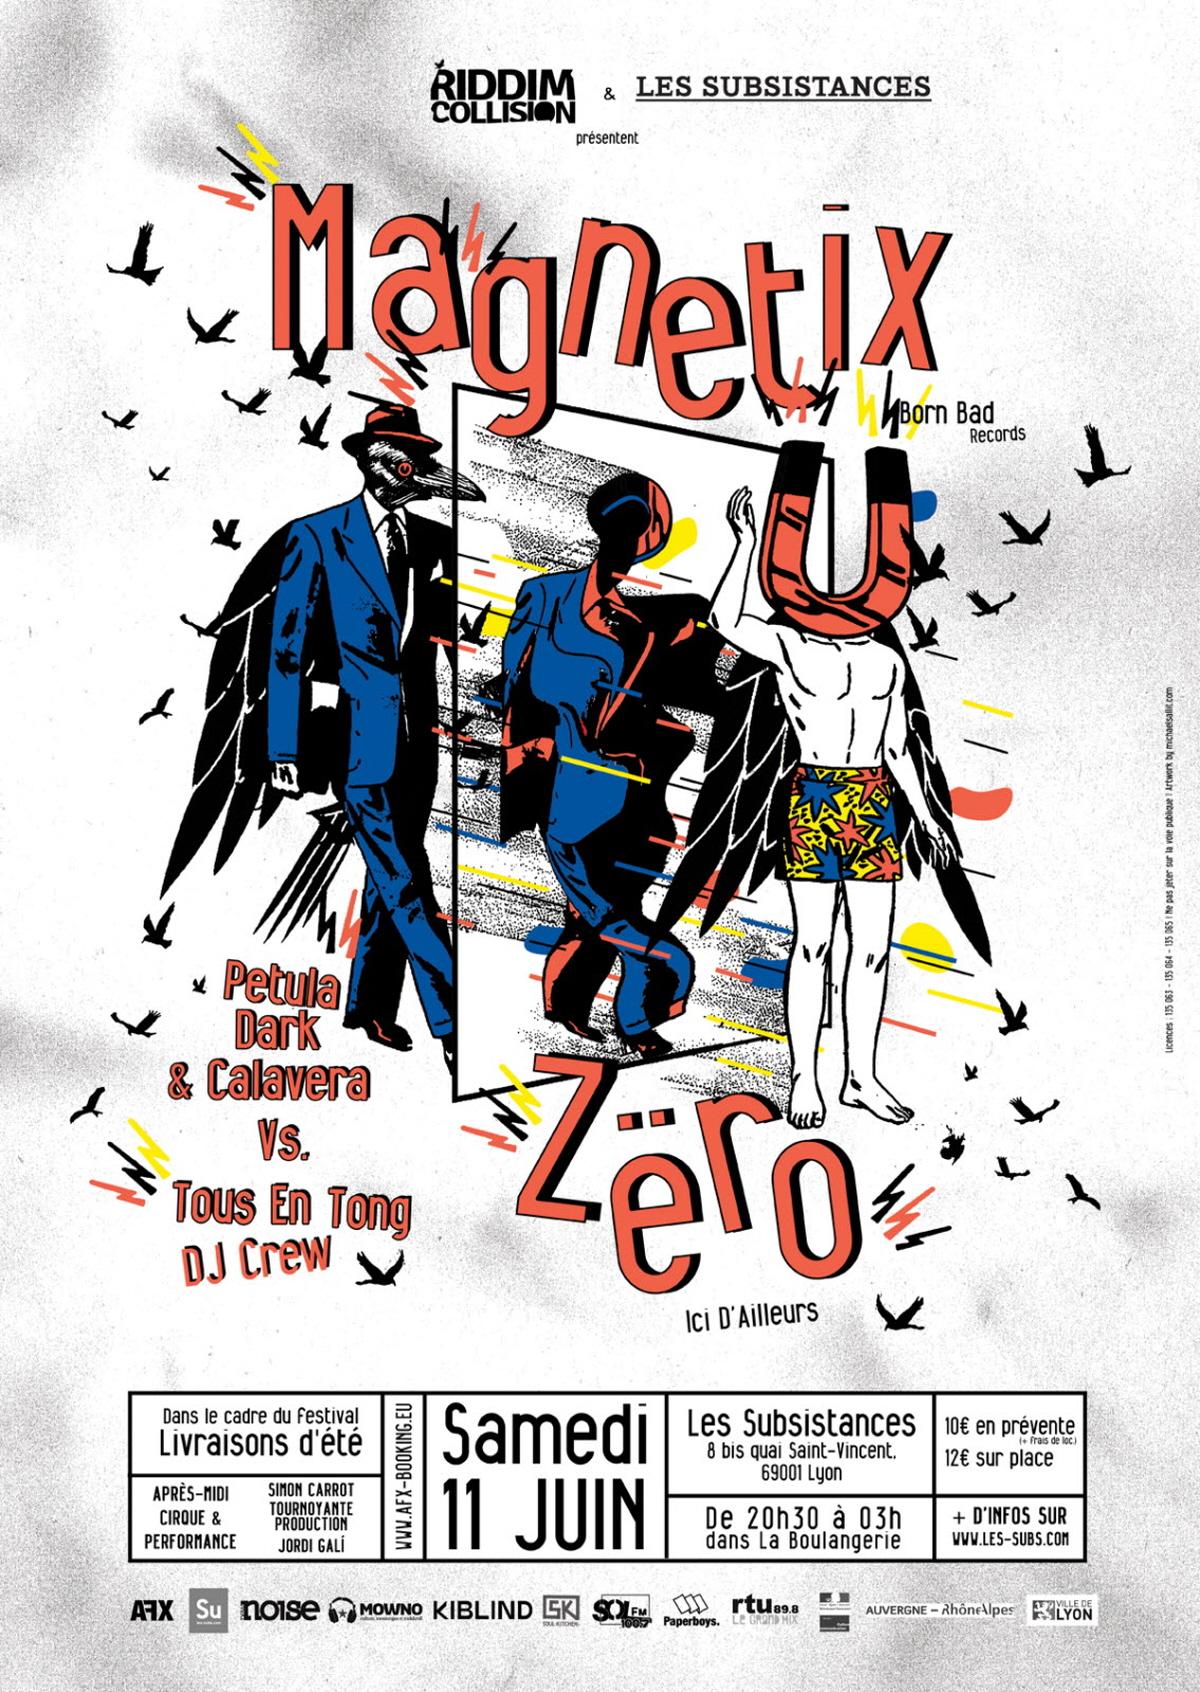 magnetix-zero-petula-dark-calavera-vs-tous-en-tong-dj-crew